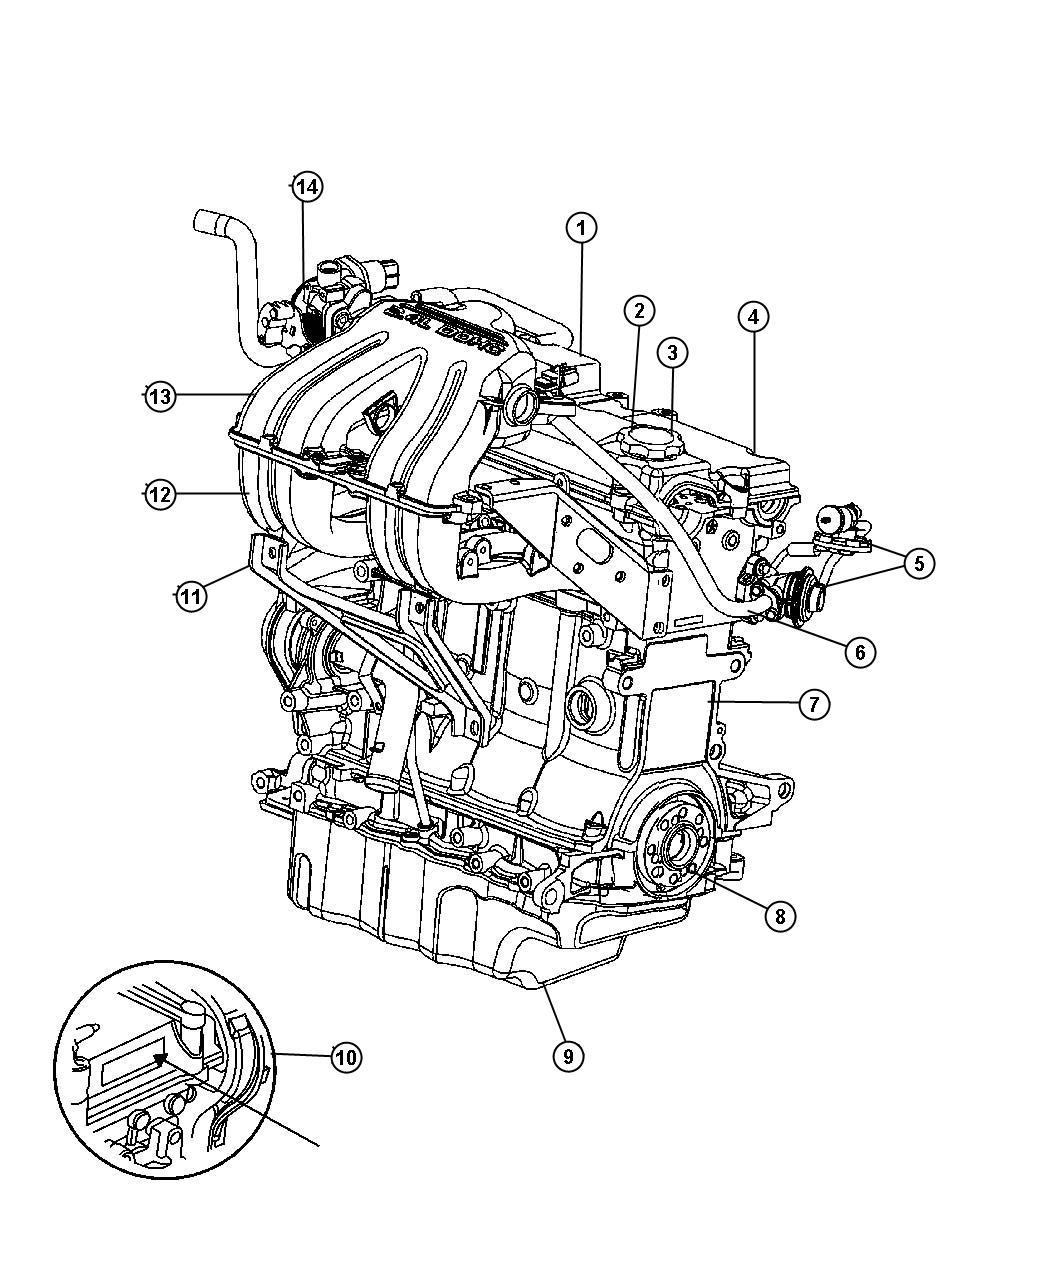 Dodge Caravan Cap. Oil filler. From 02/06/03, includes o